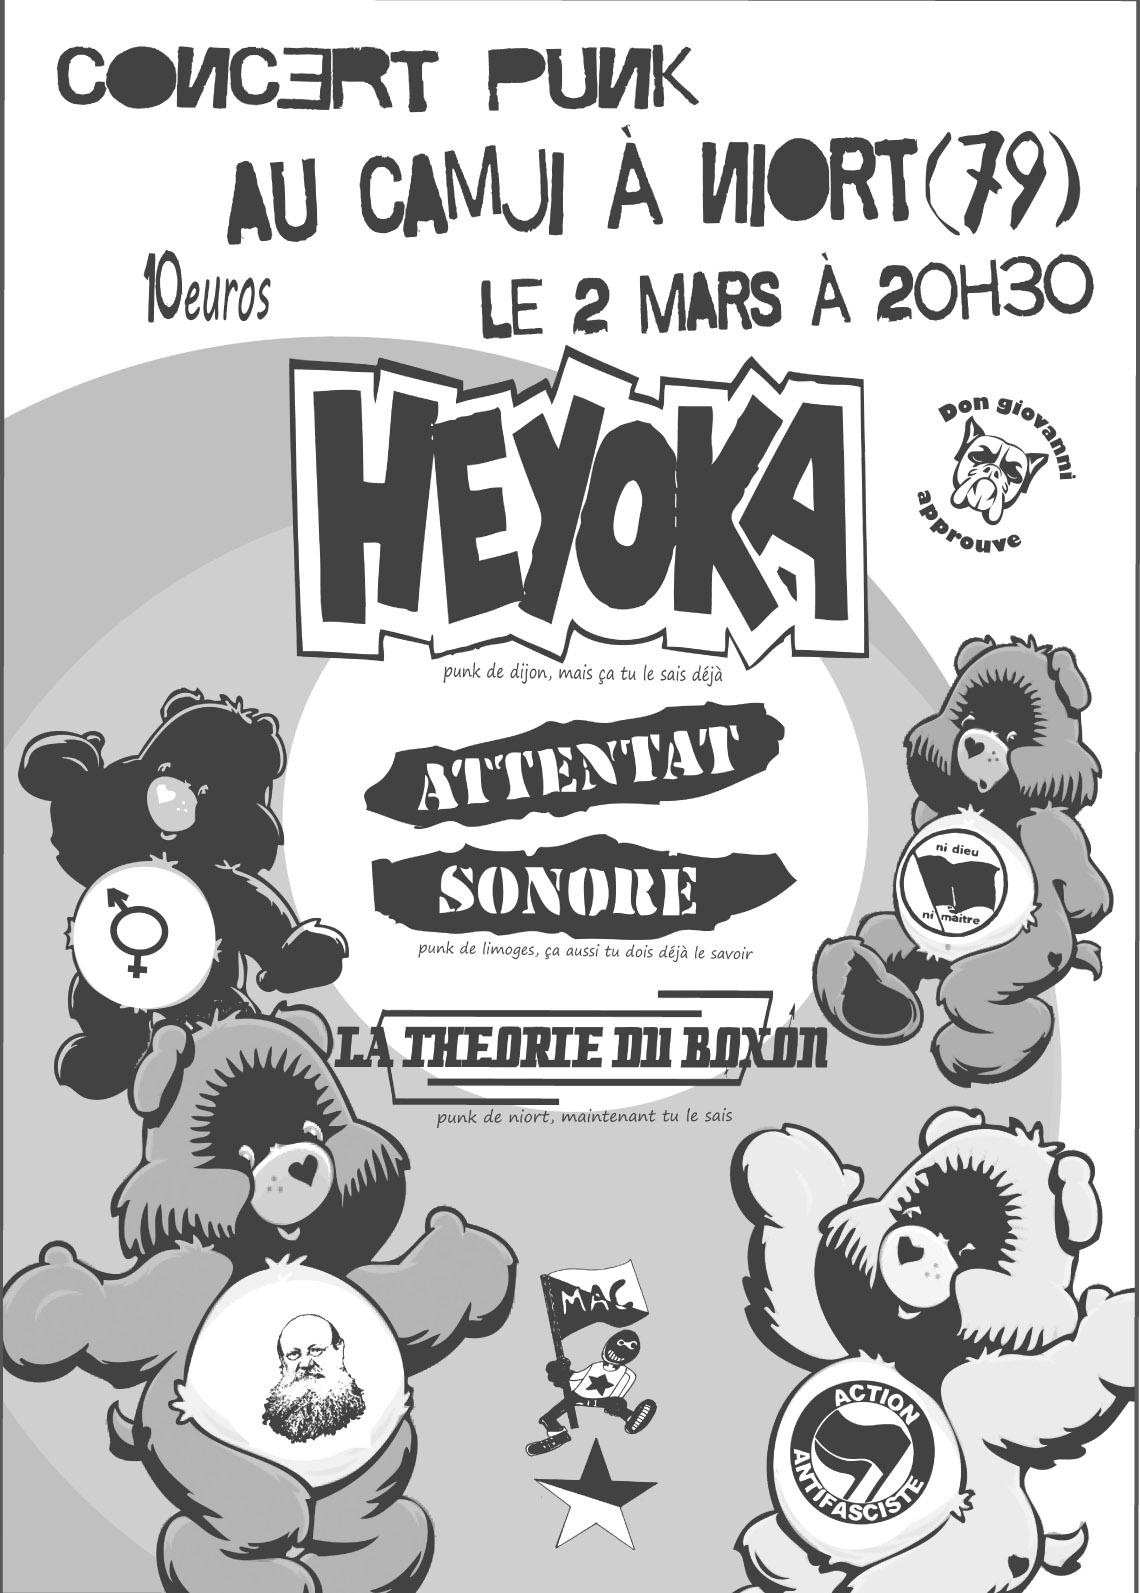 Heyoka + Attentat Sonore + La Théorie du Boxon